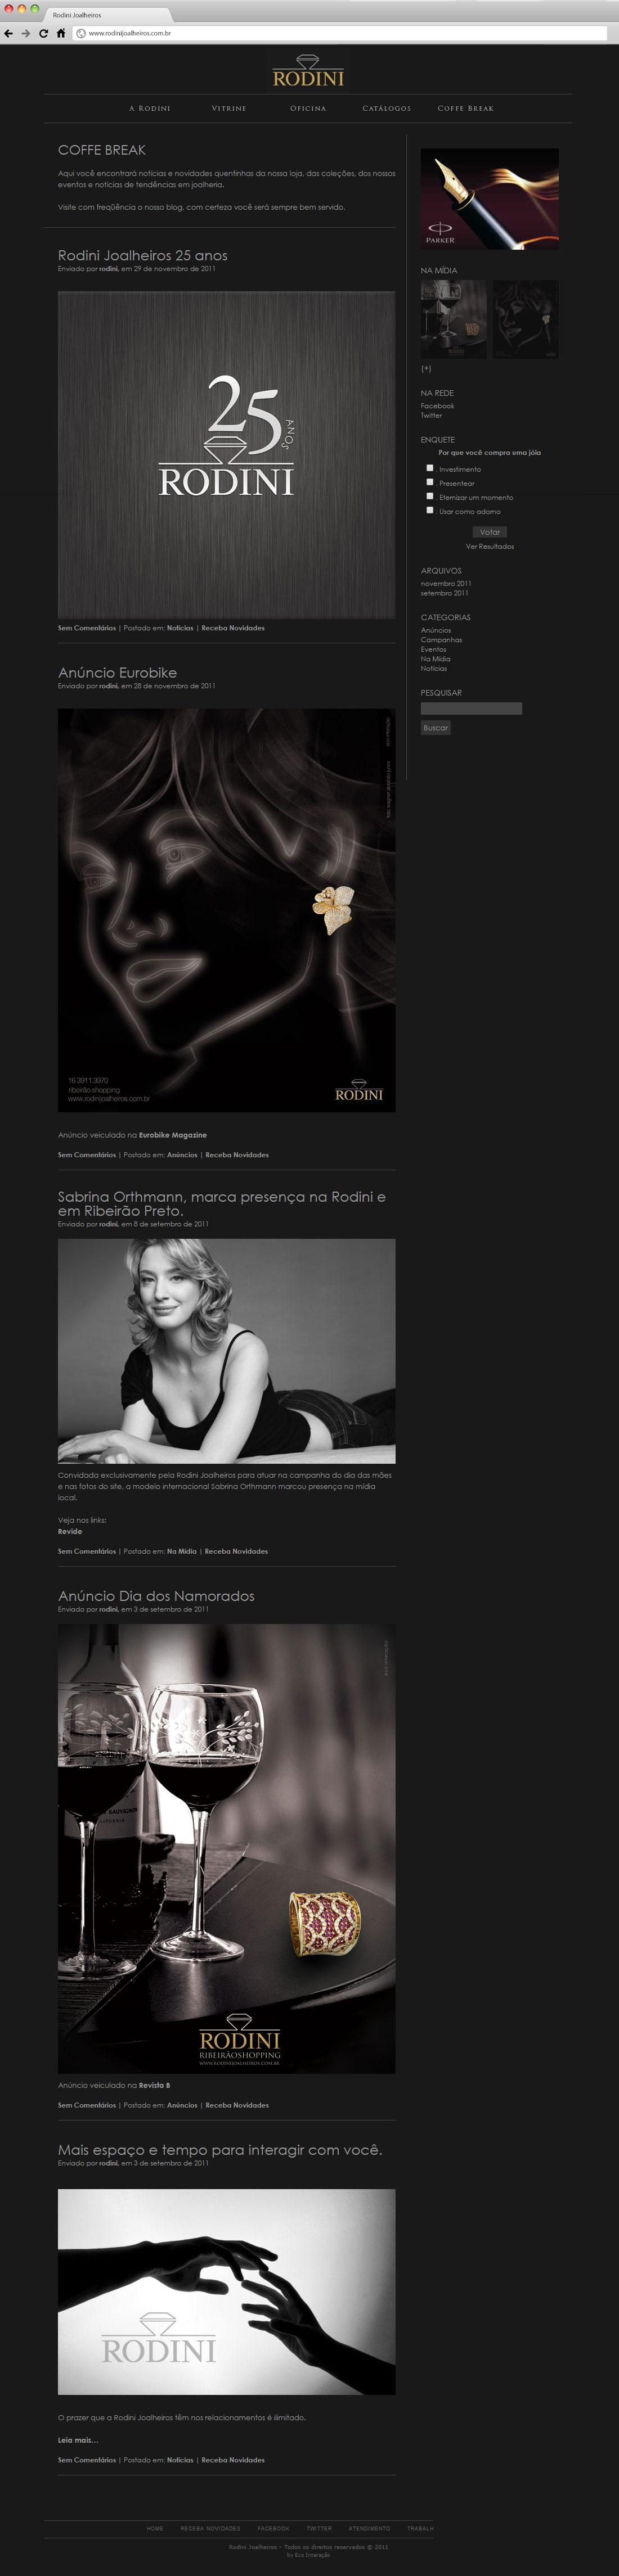 rodini-joalheiros-website-blog